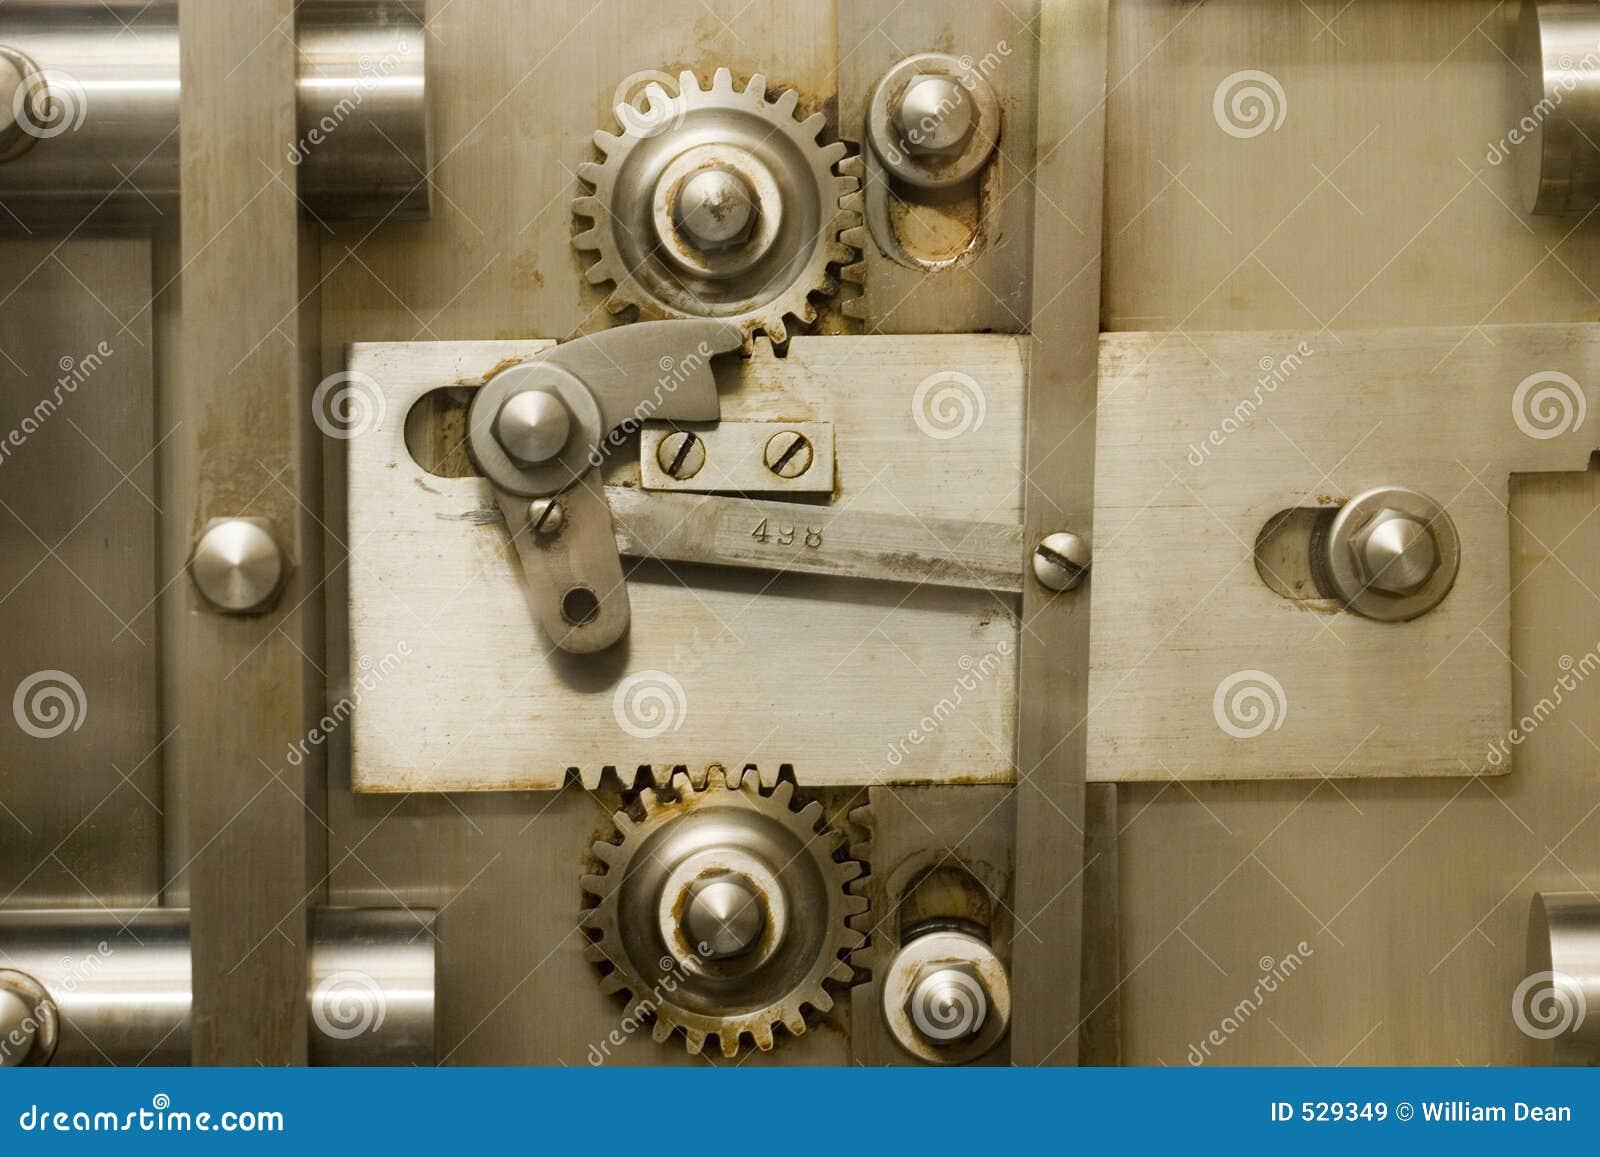 Download 安全2个的齿轮 库存图片. 图片 包括有 锁定, 杠杆, 行动, 安全, 纹理, 金属, 关闭, 嵌齿轮, 开放 - 529349